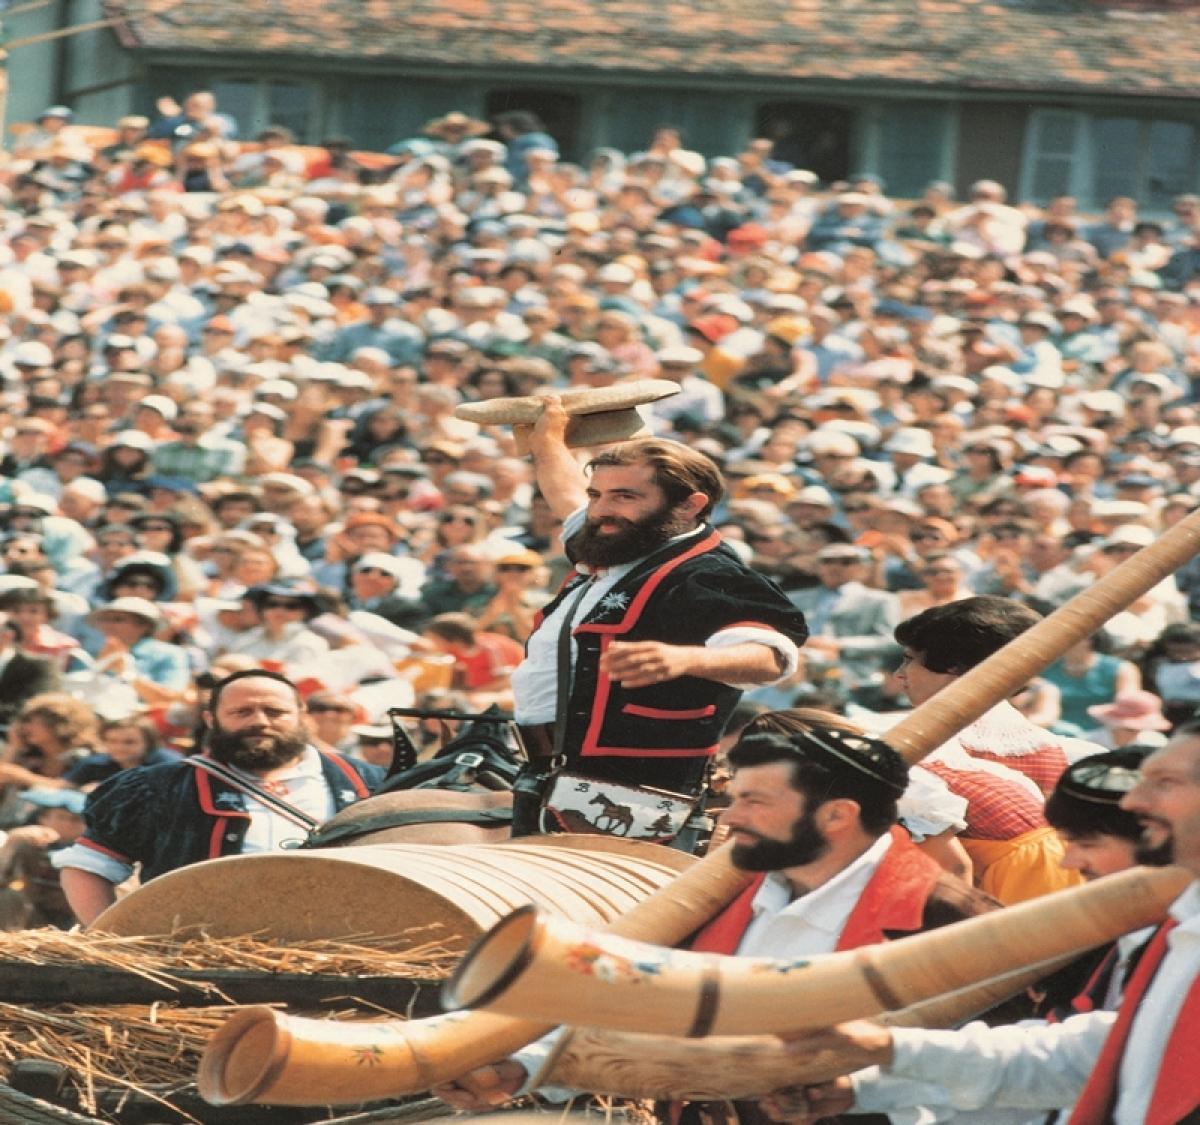 Switzerland's Fête des Vignerons wine festival in Vevey is happening this summer!